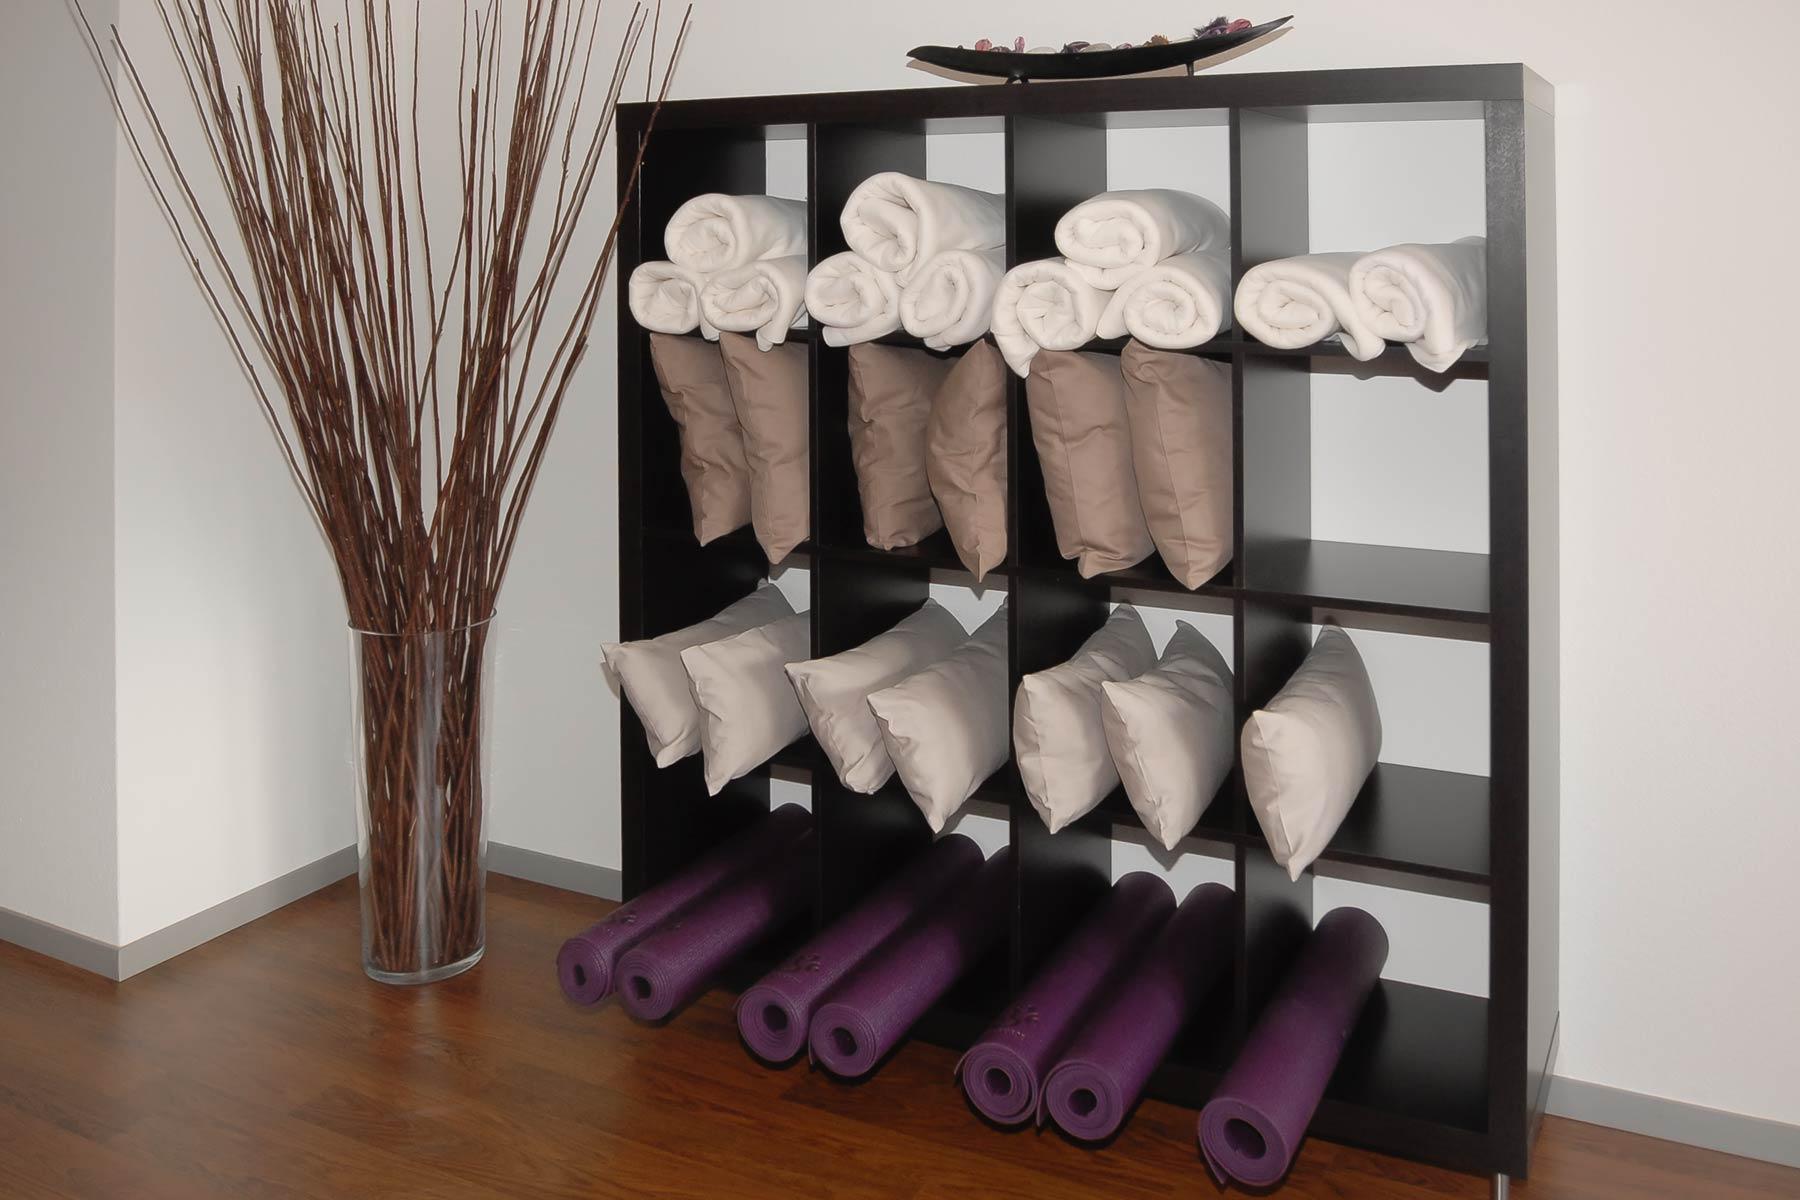 Yoga Studio: Matten, Decken, Kissen